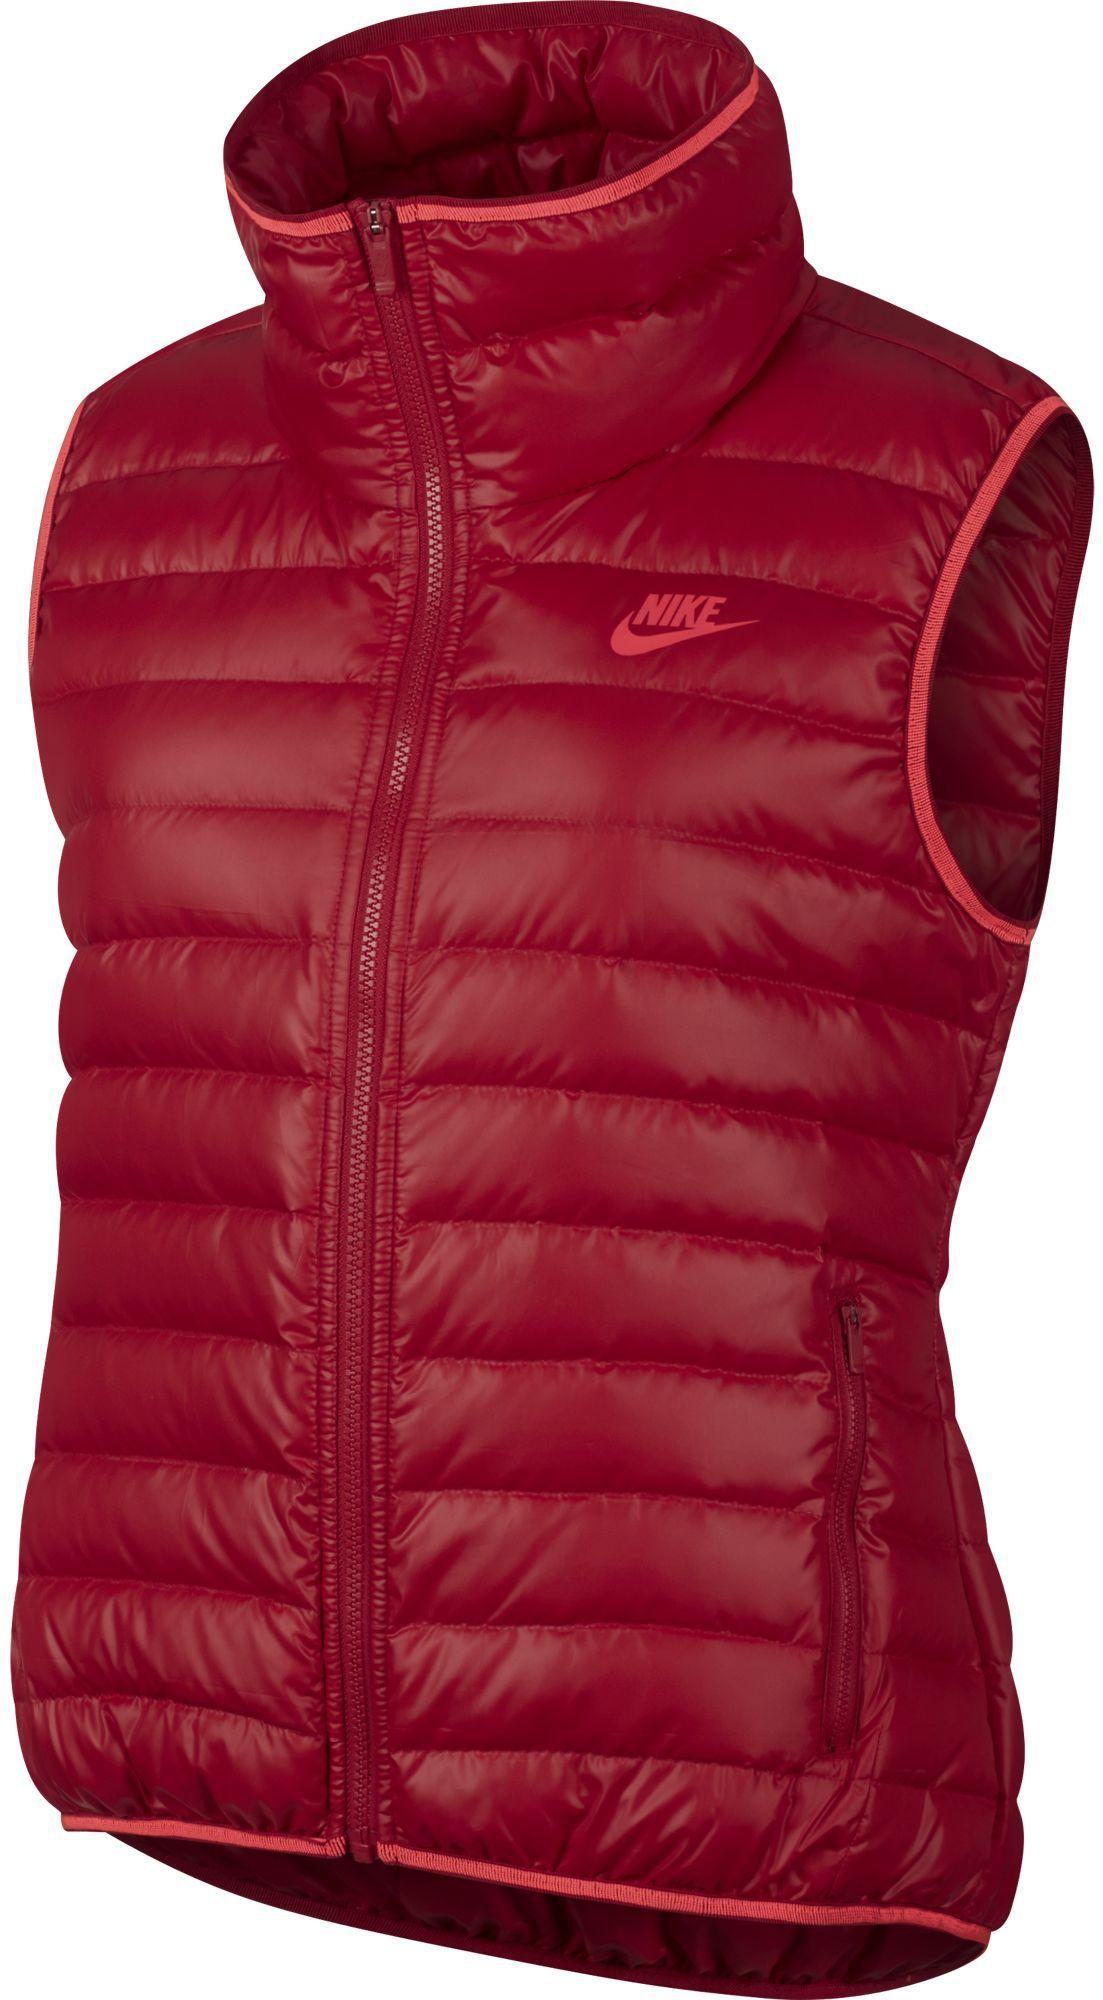 c99e3a3e96f1 Nike SPORTSWEAR VEST. Women s vest